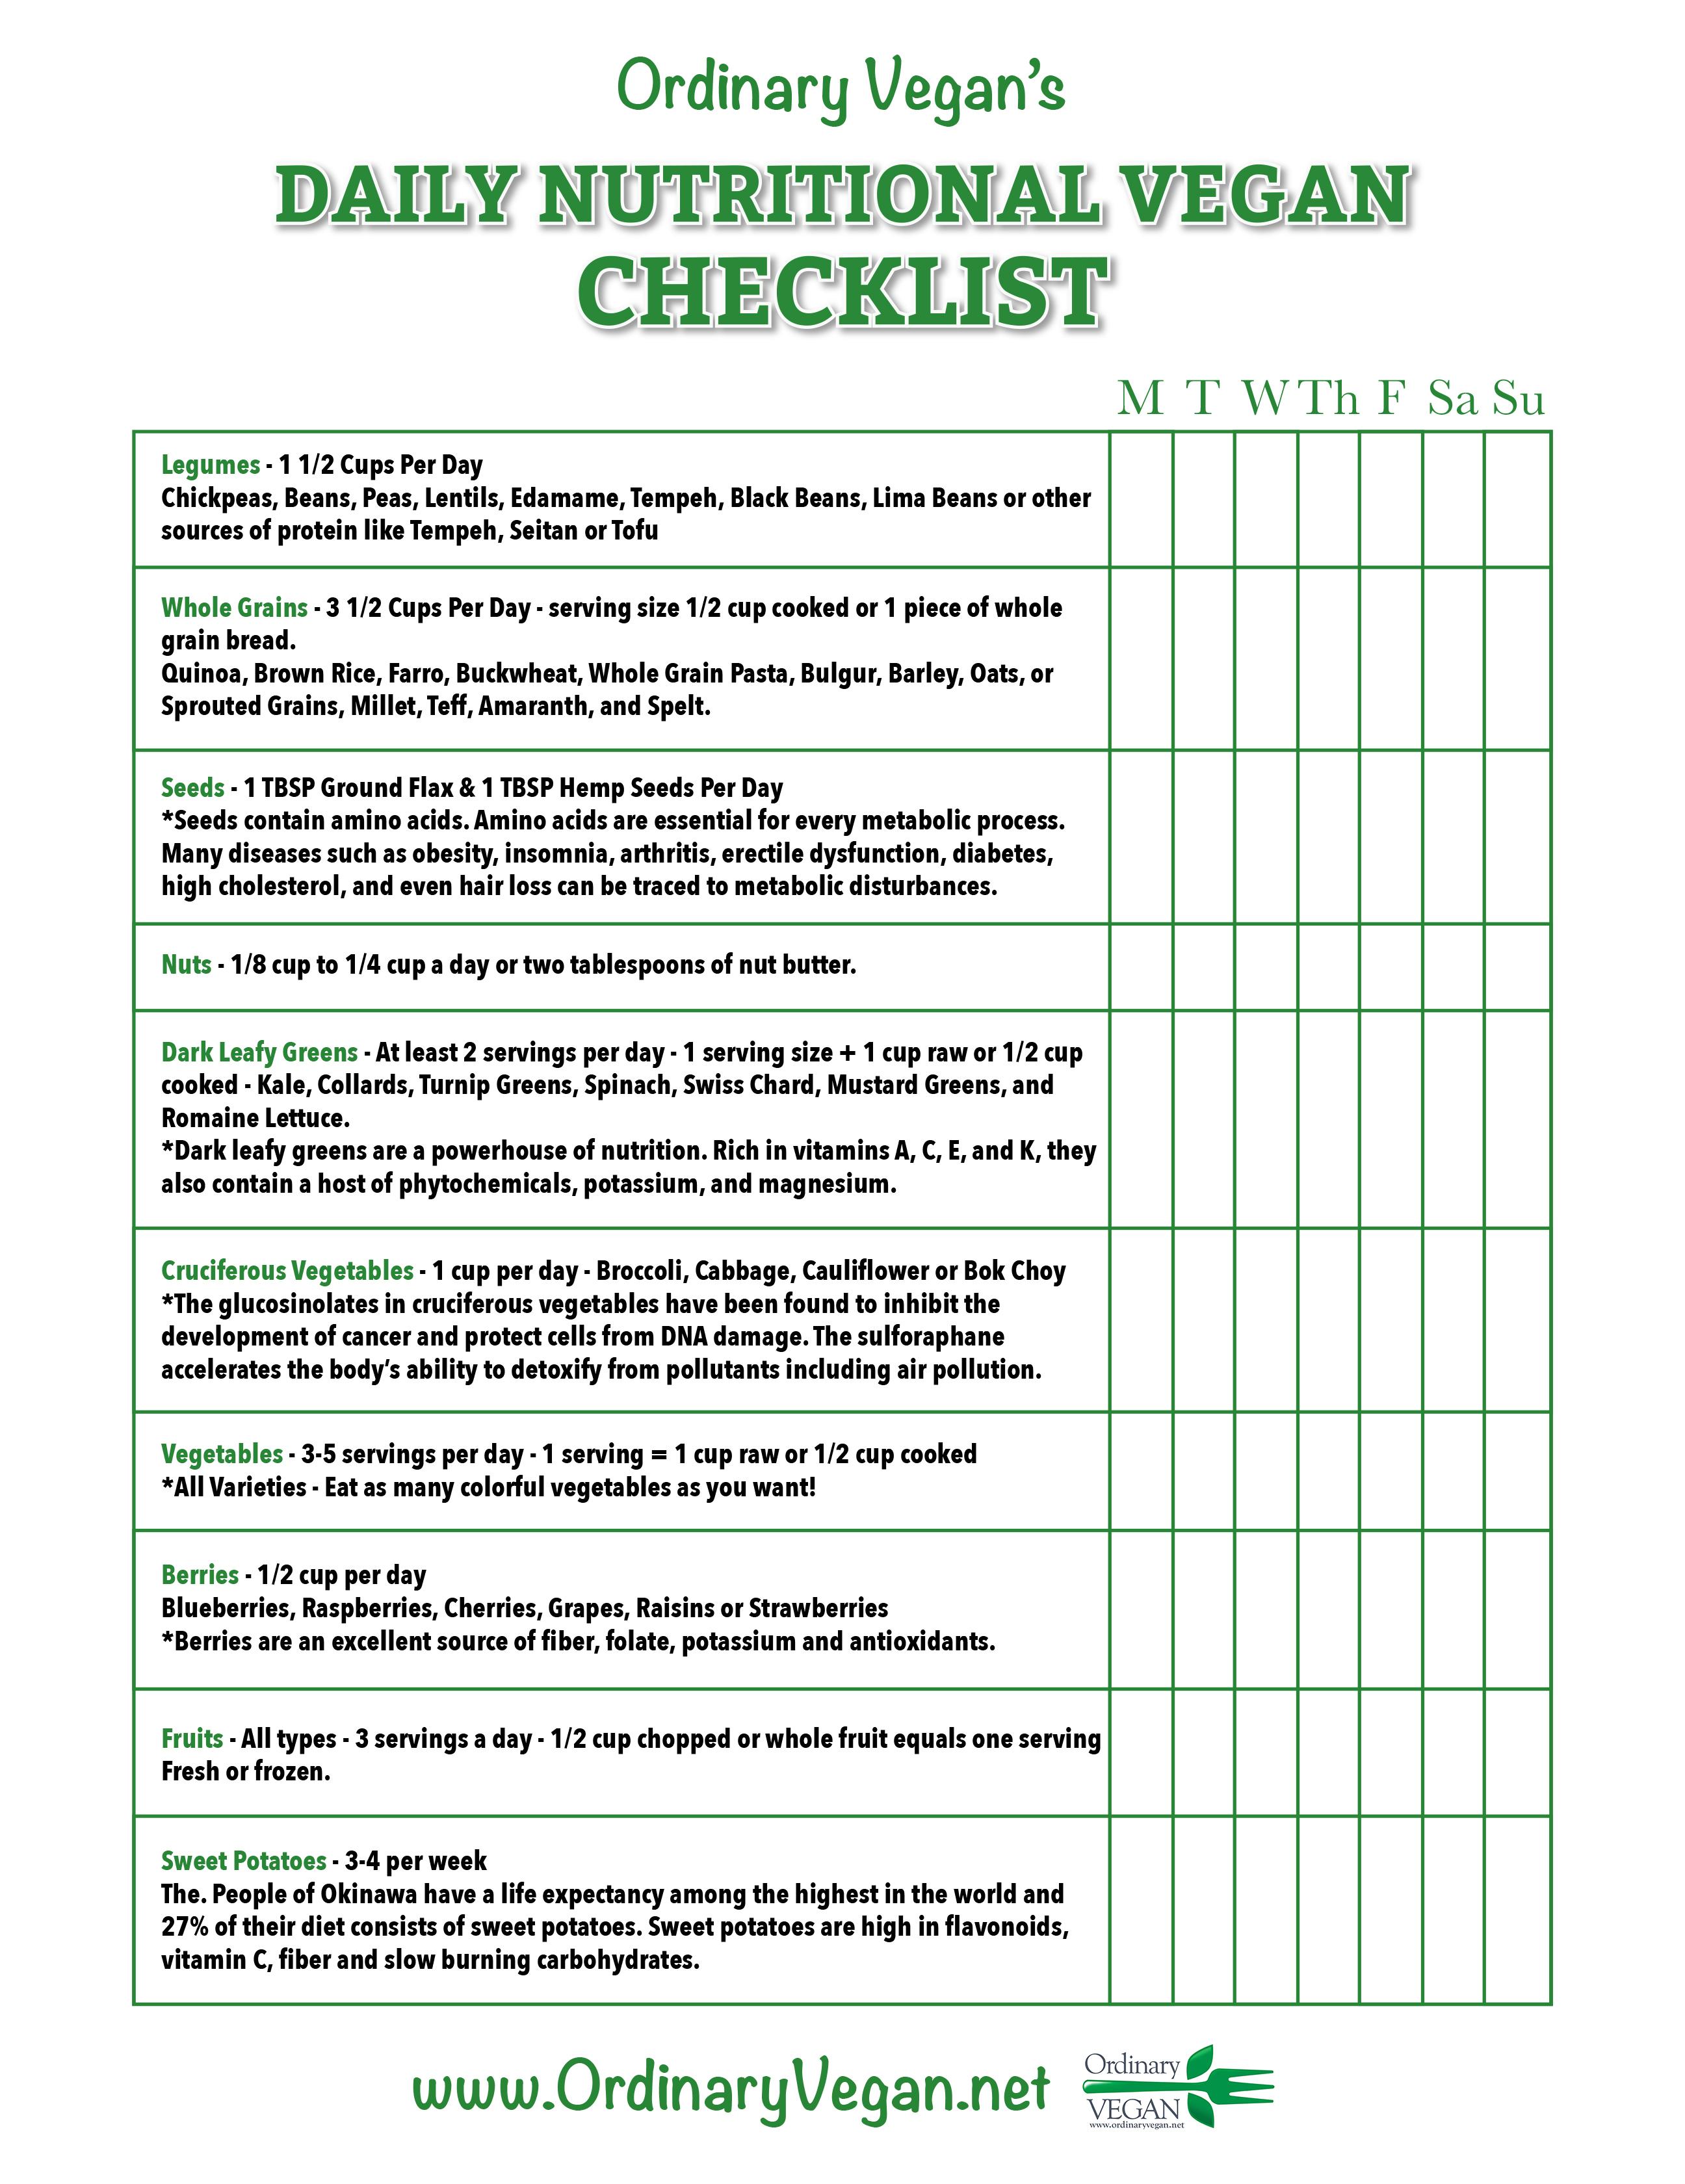 Vegan Nutrition Checklist For A Healthy Vegant